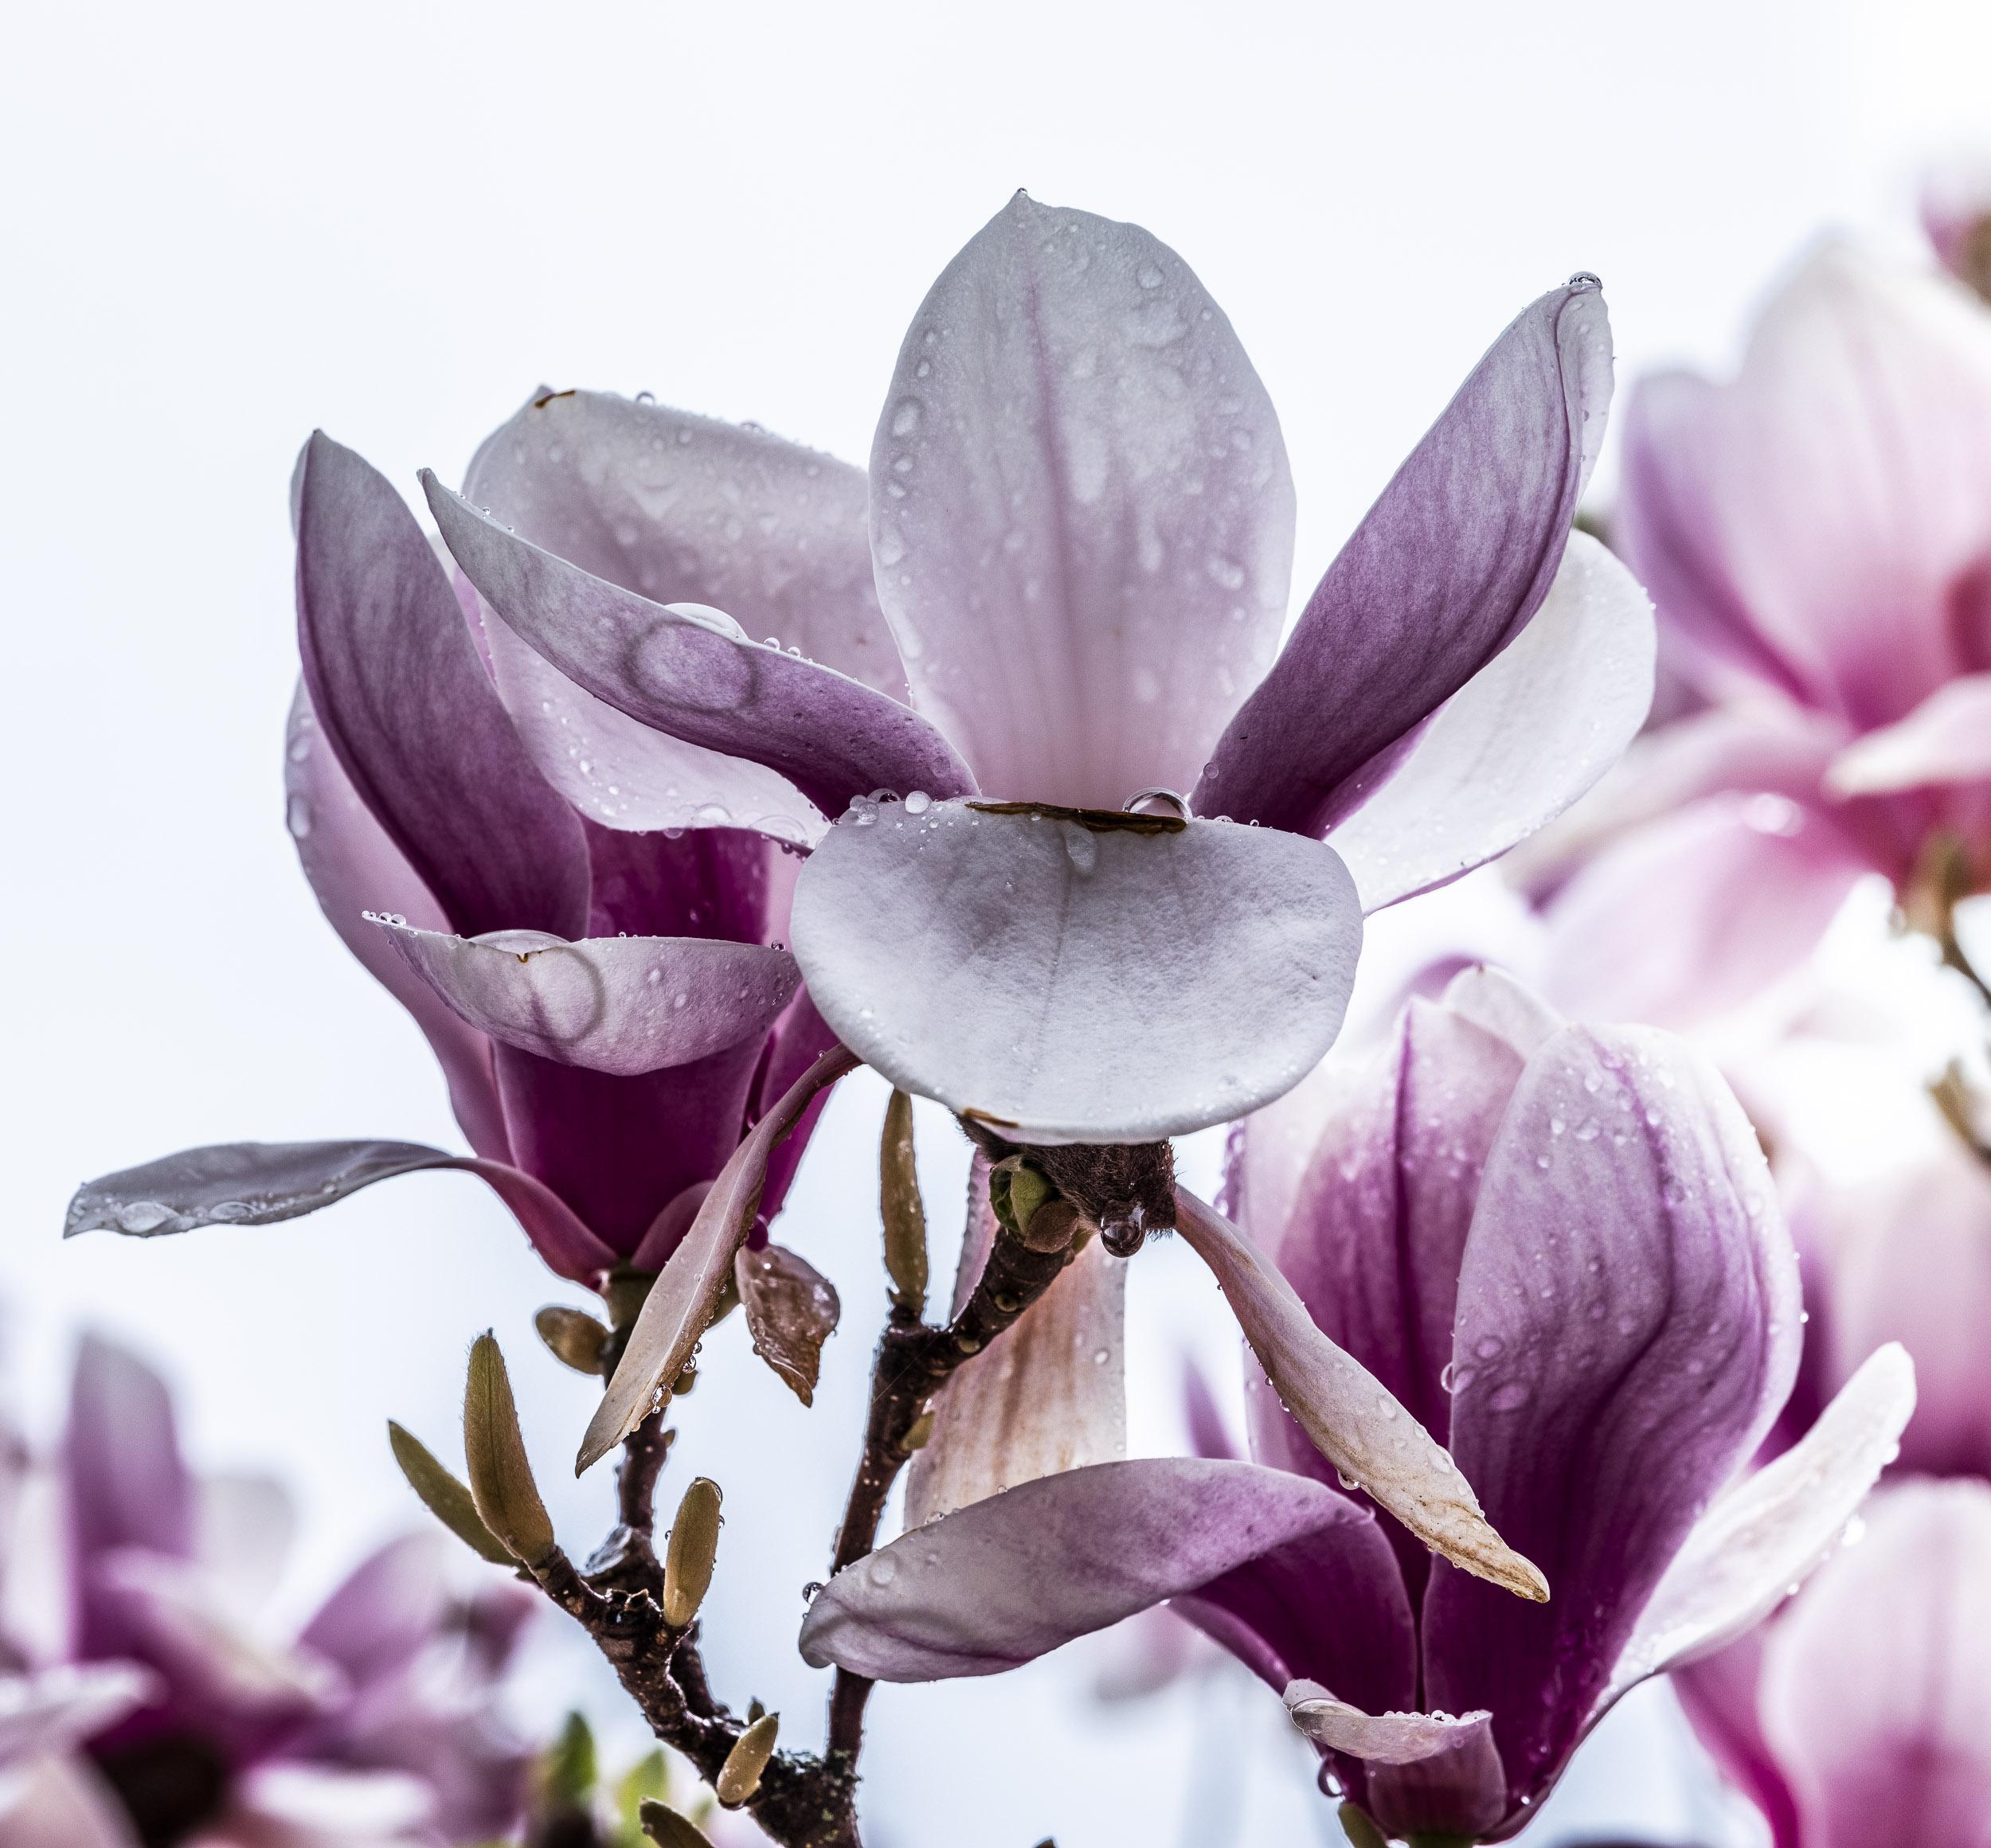 20190410_magnolia__DSF8777.jpg